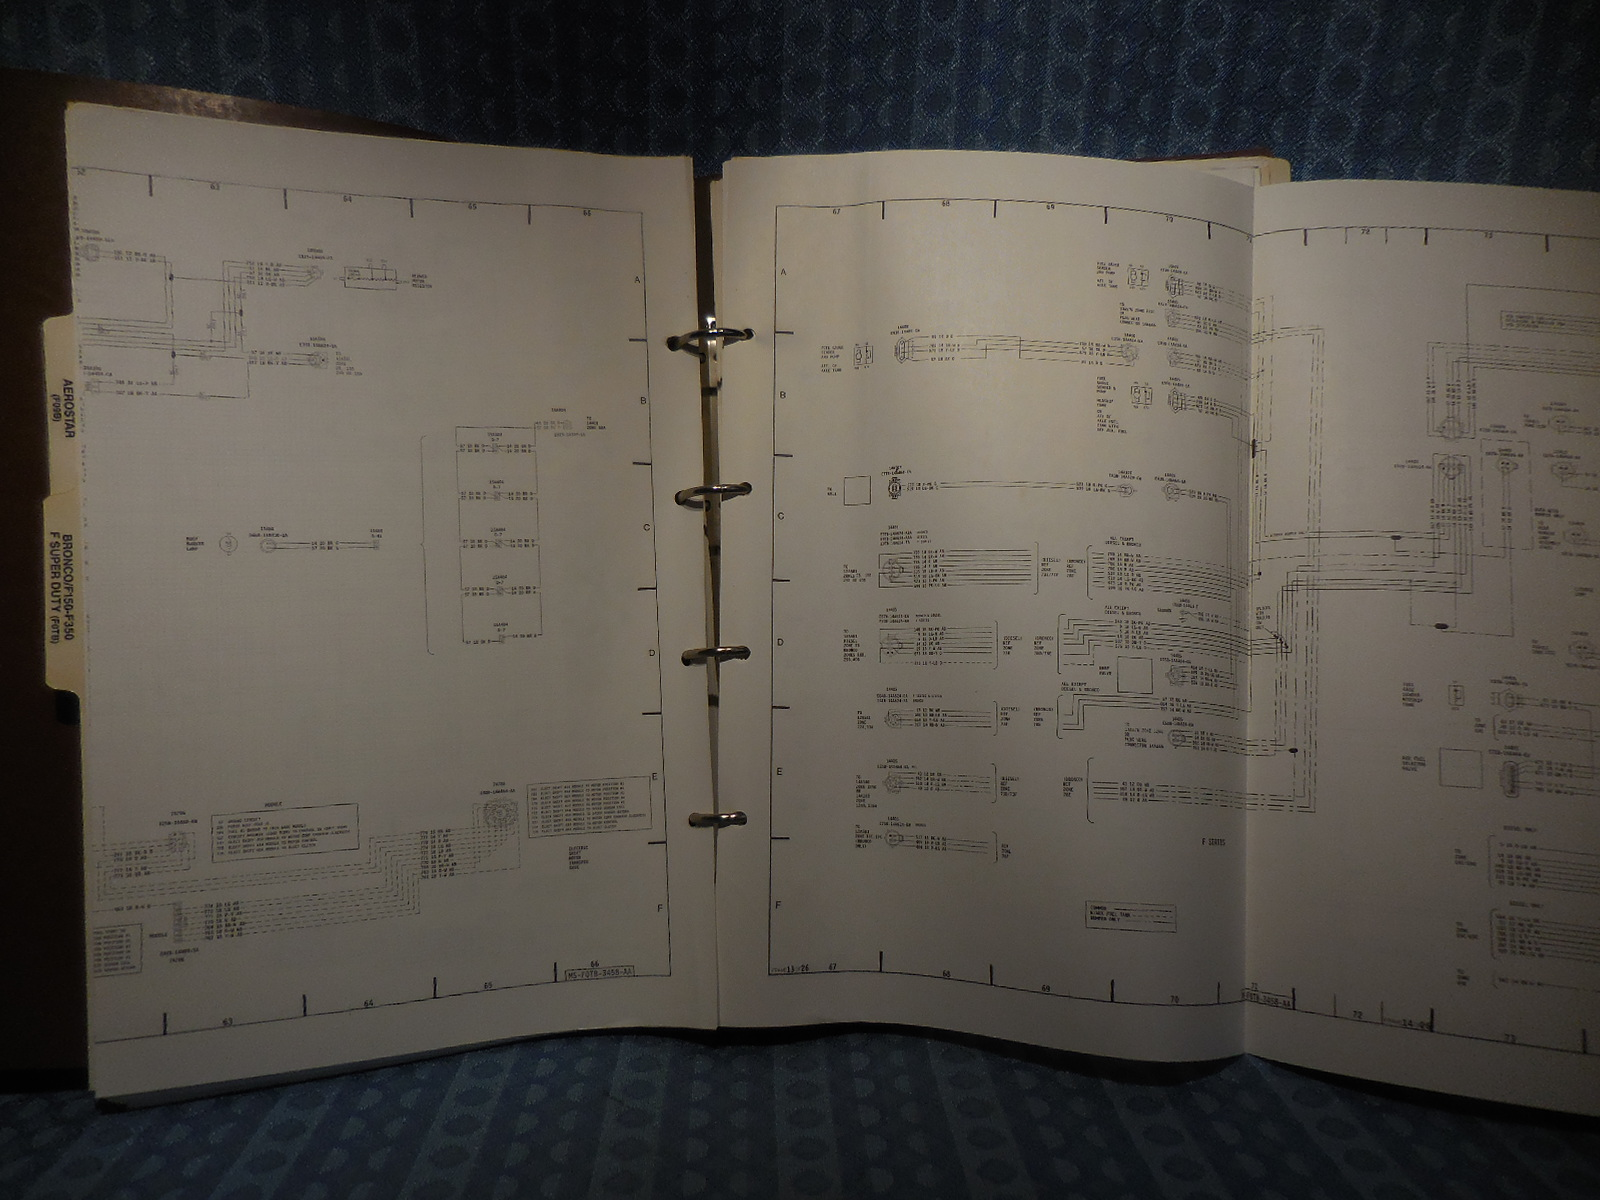 1990 Ford Truck Oem Wiring Diagrams F Series Econoline Bronco Cl 9000 L Series Nos Texas Parts Llc Antique Auto Parts